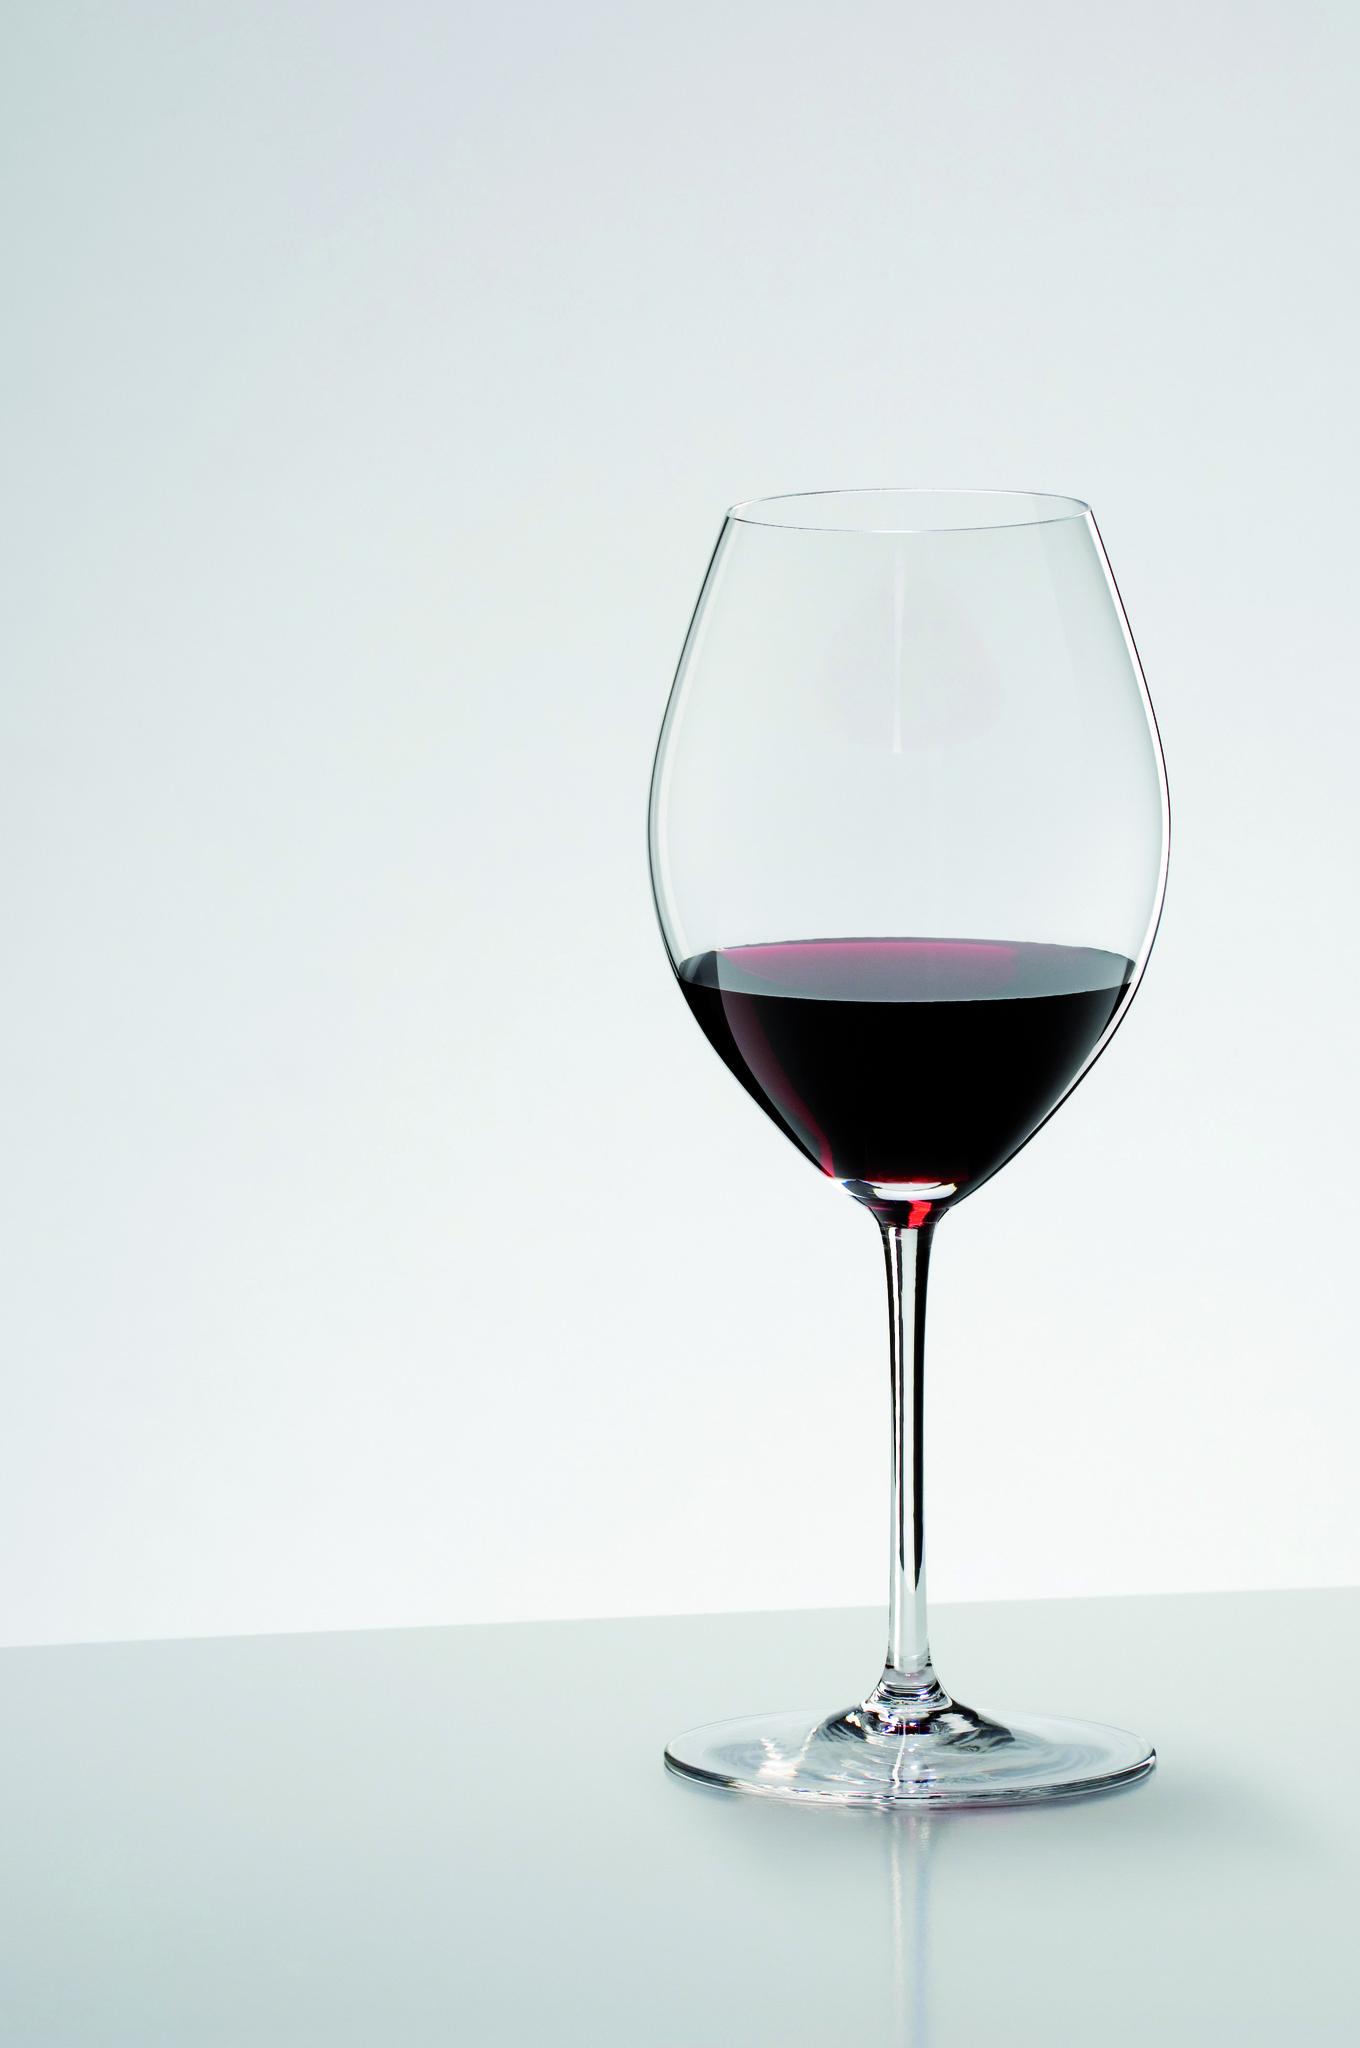 Бокалы Бокал для красного вина 590мл Riedel Sommeliers Hermitage bokal-dlya-krasnogo-vina-590-ml-riedel-hermitage-avstriya.jpg